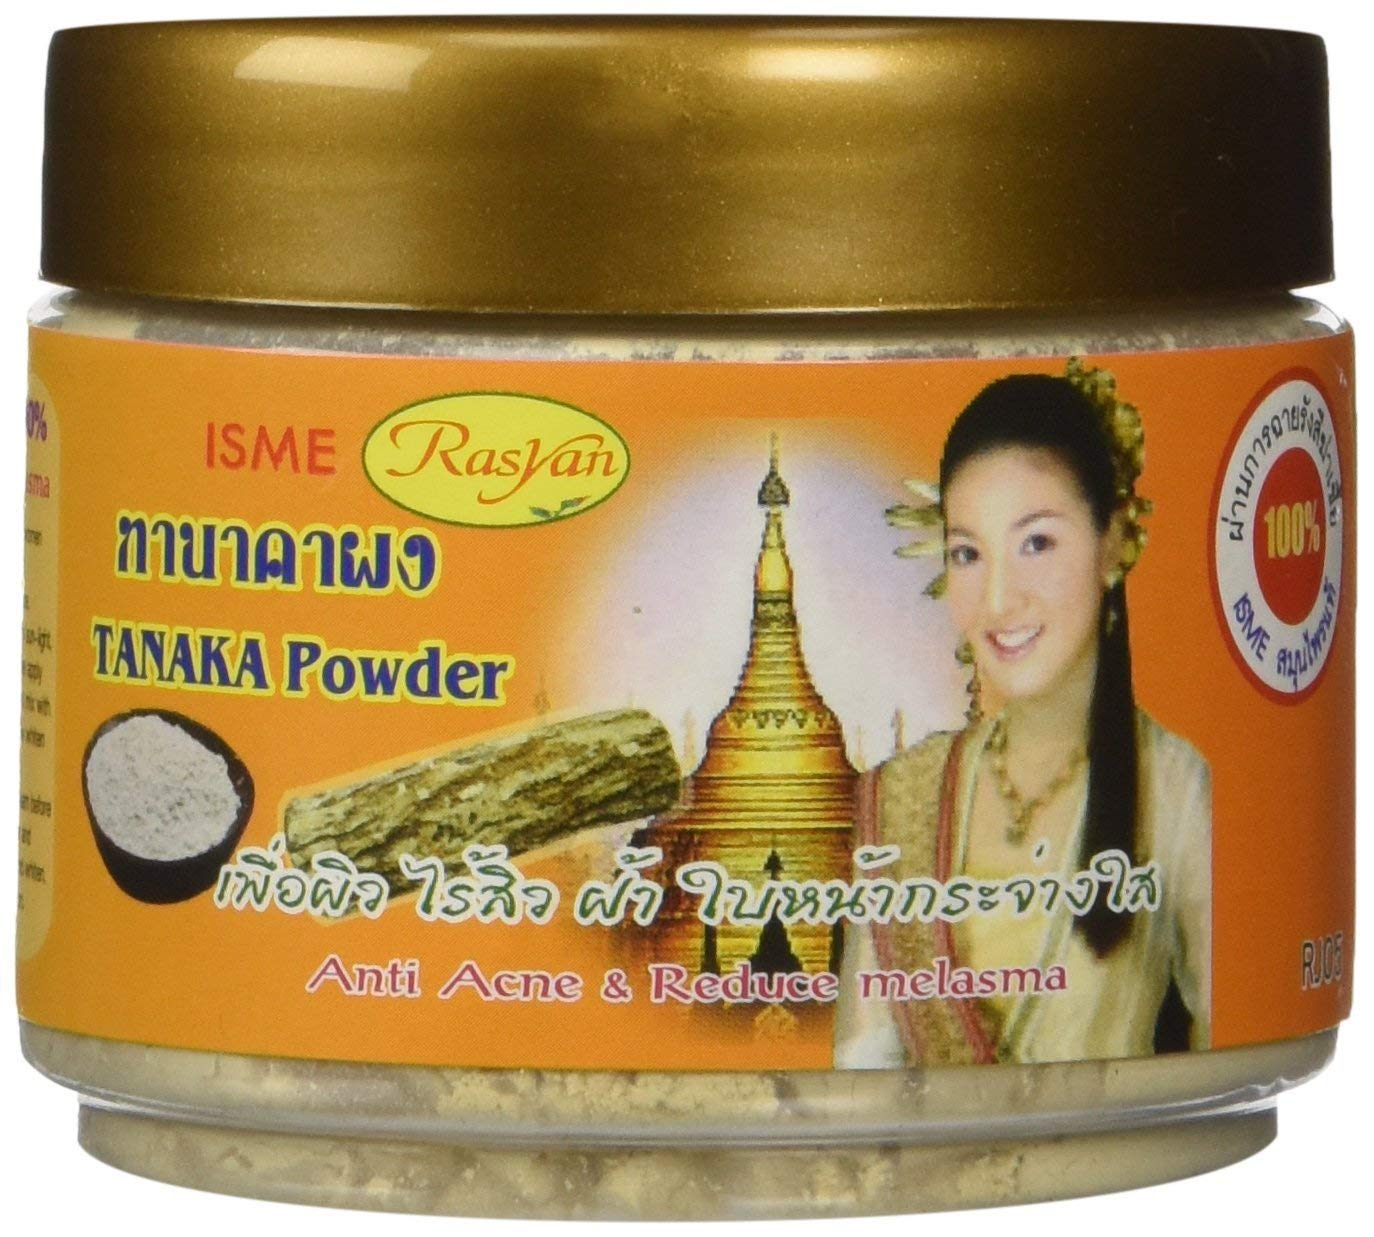 2 X Isme Rasyan Thanaka Tanaka Powder 100% for Anti Acne & Reduce Melasma Natural Herbal 50g